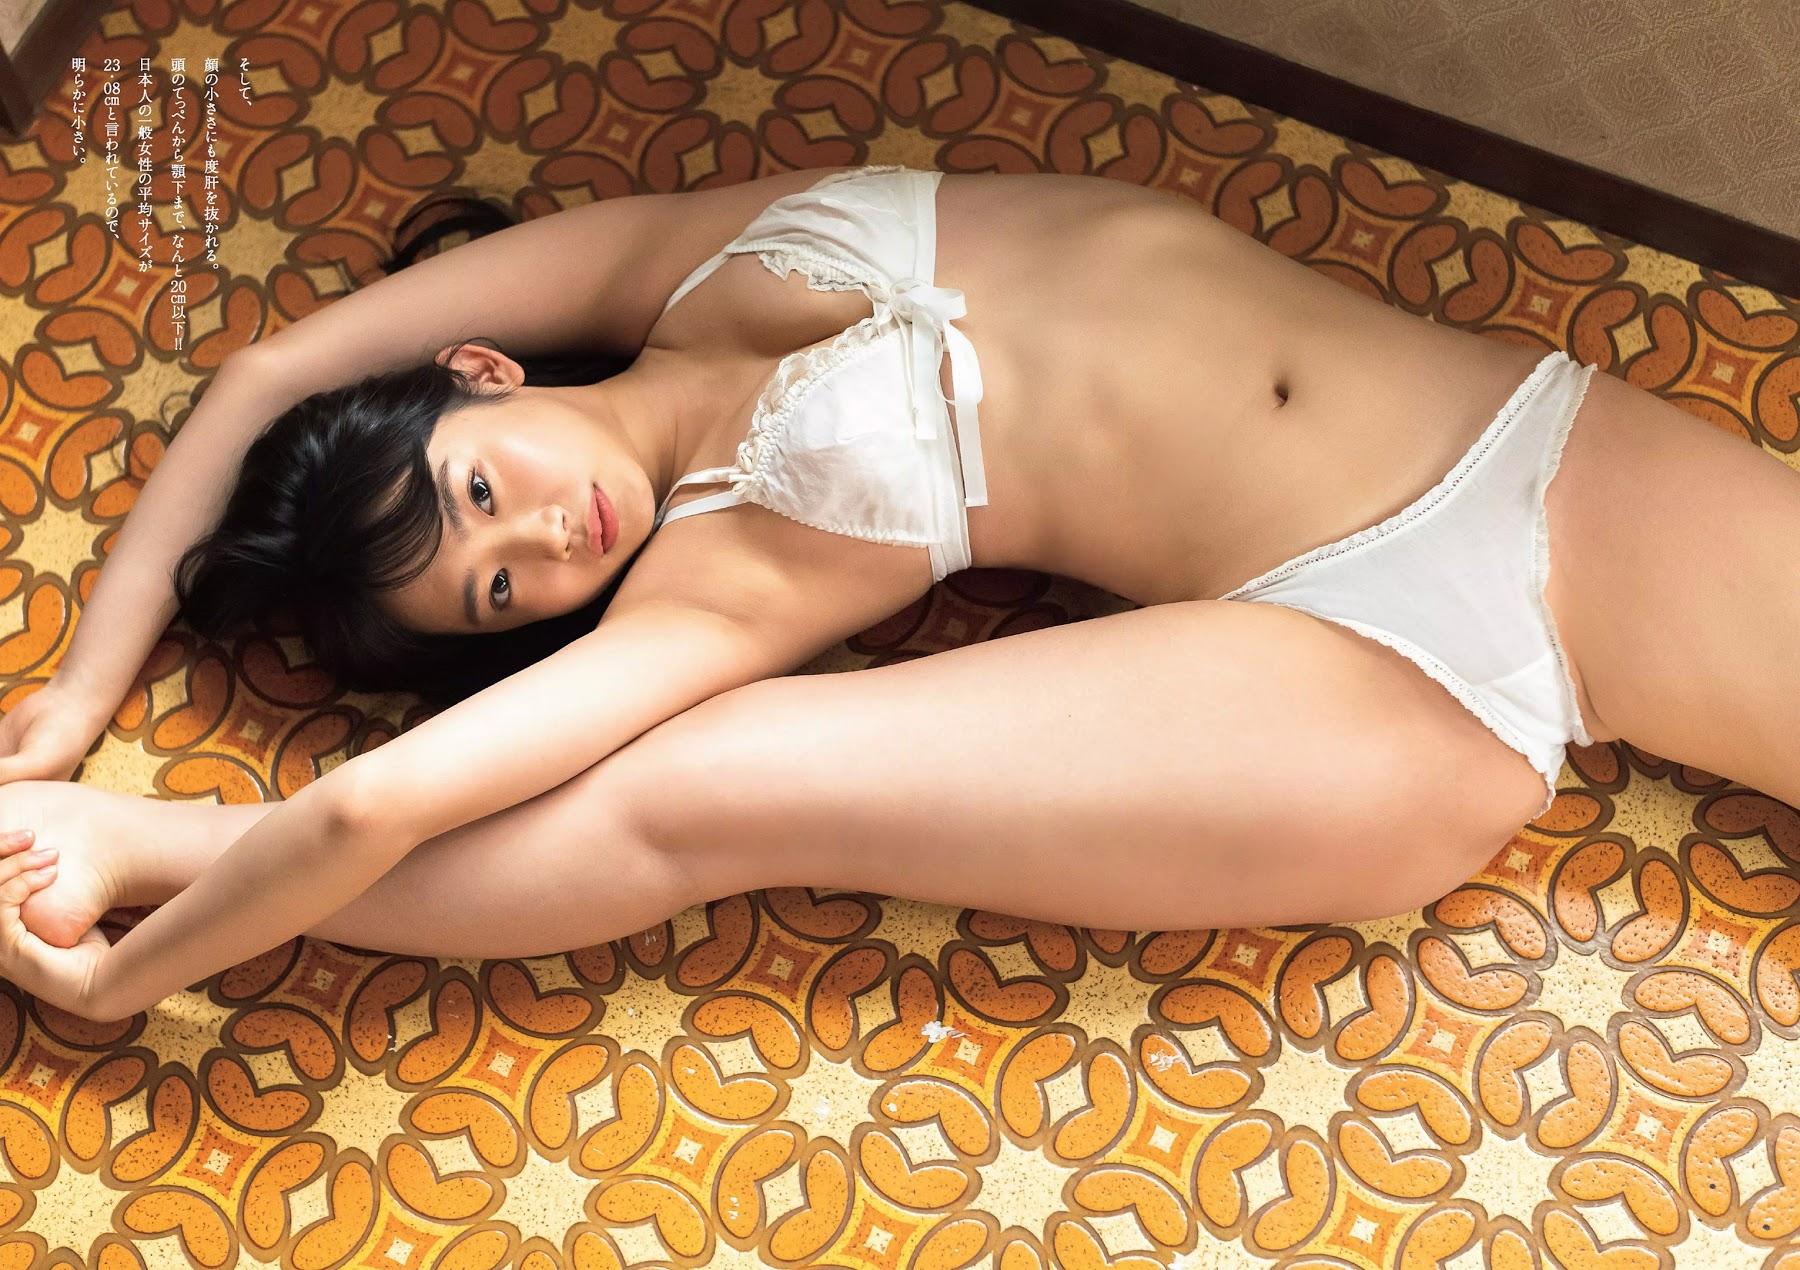 AIZAWA NANAKO003